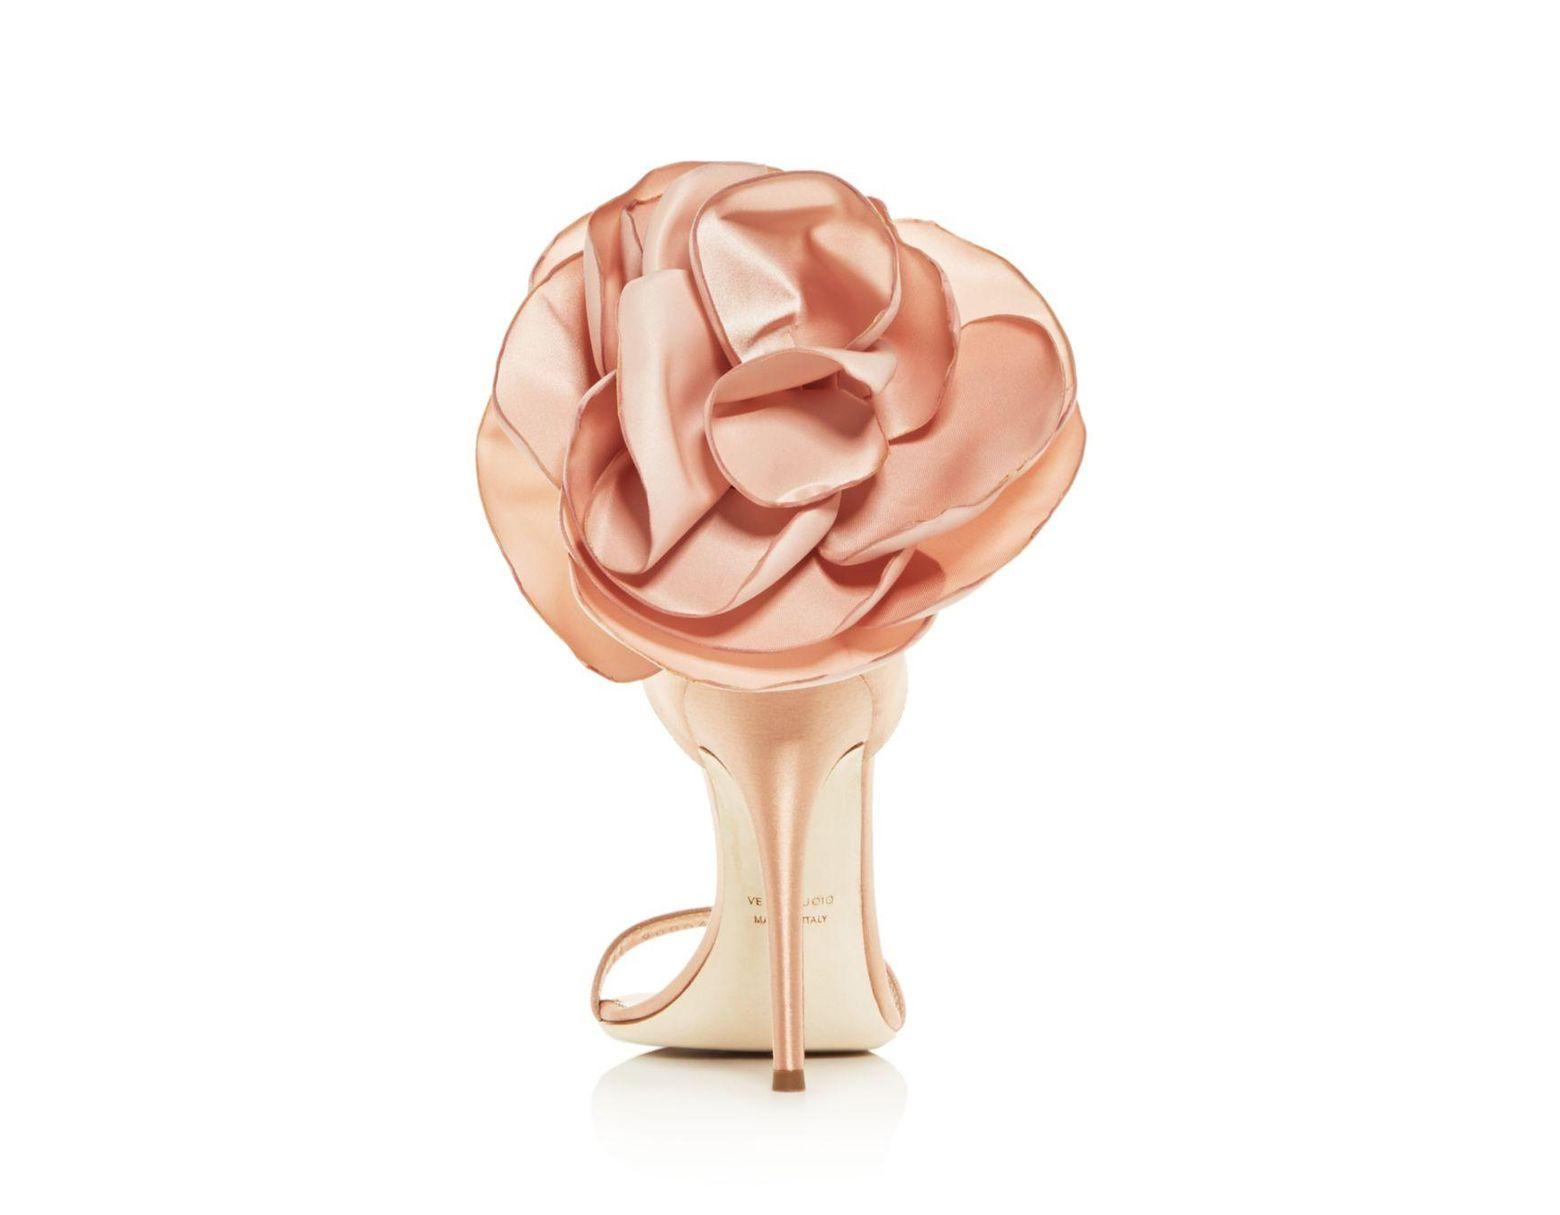 f5b4d16342289 Giuseppe Zanotti Satin Flower High Sandals - Save 18% - Lyst